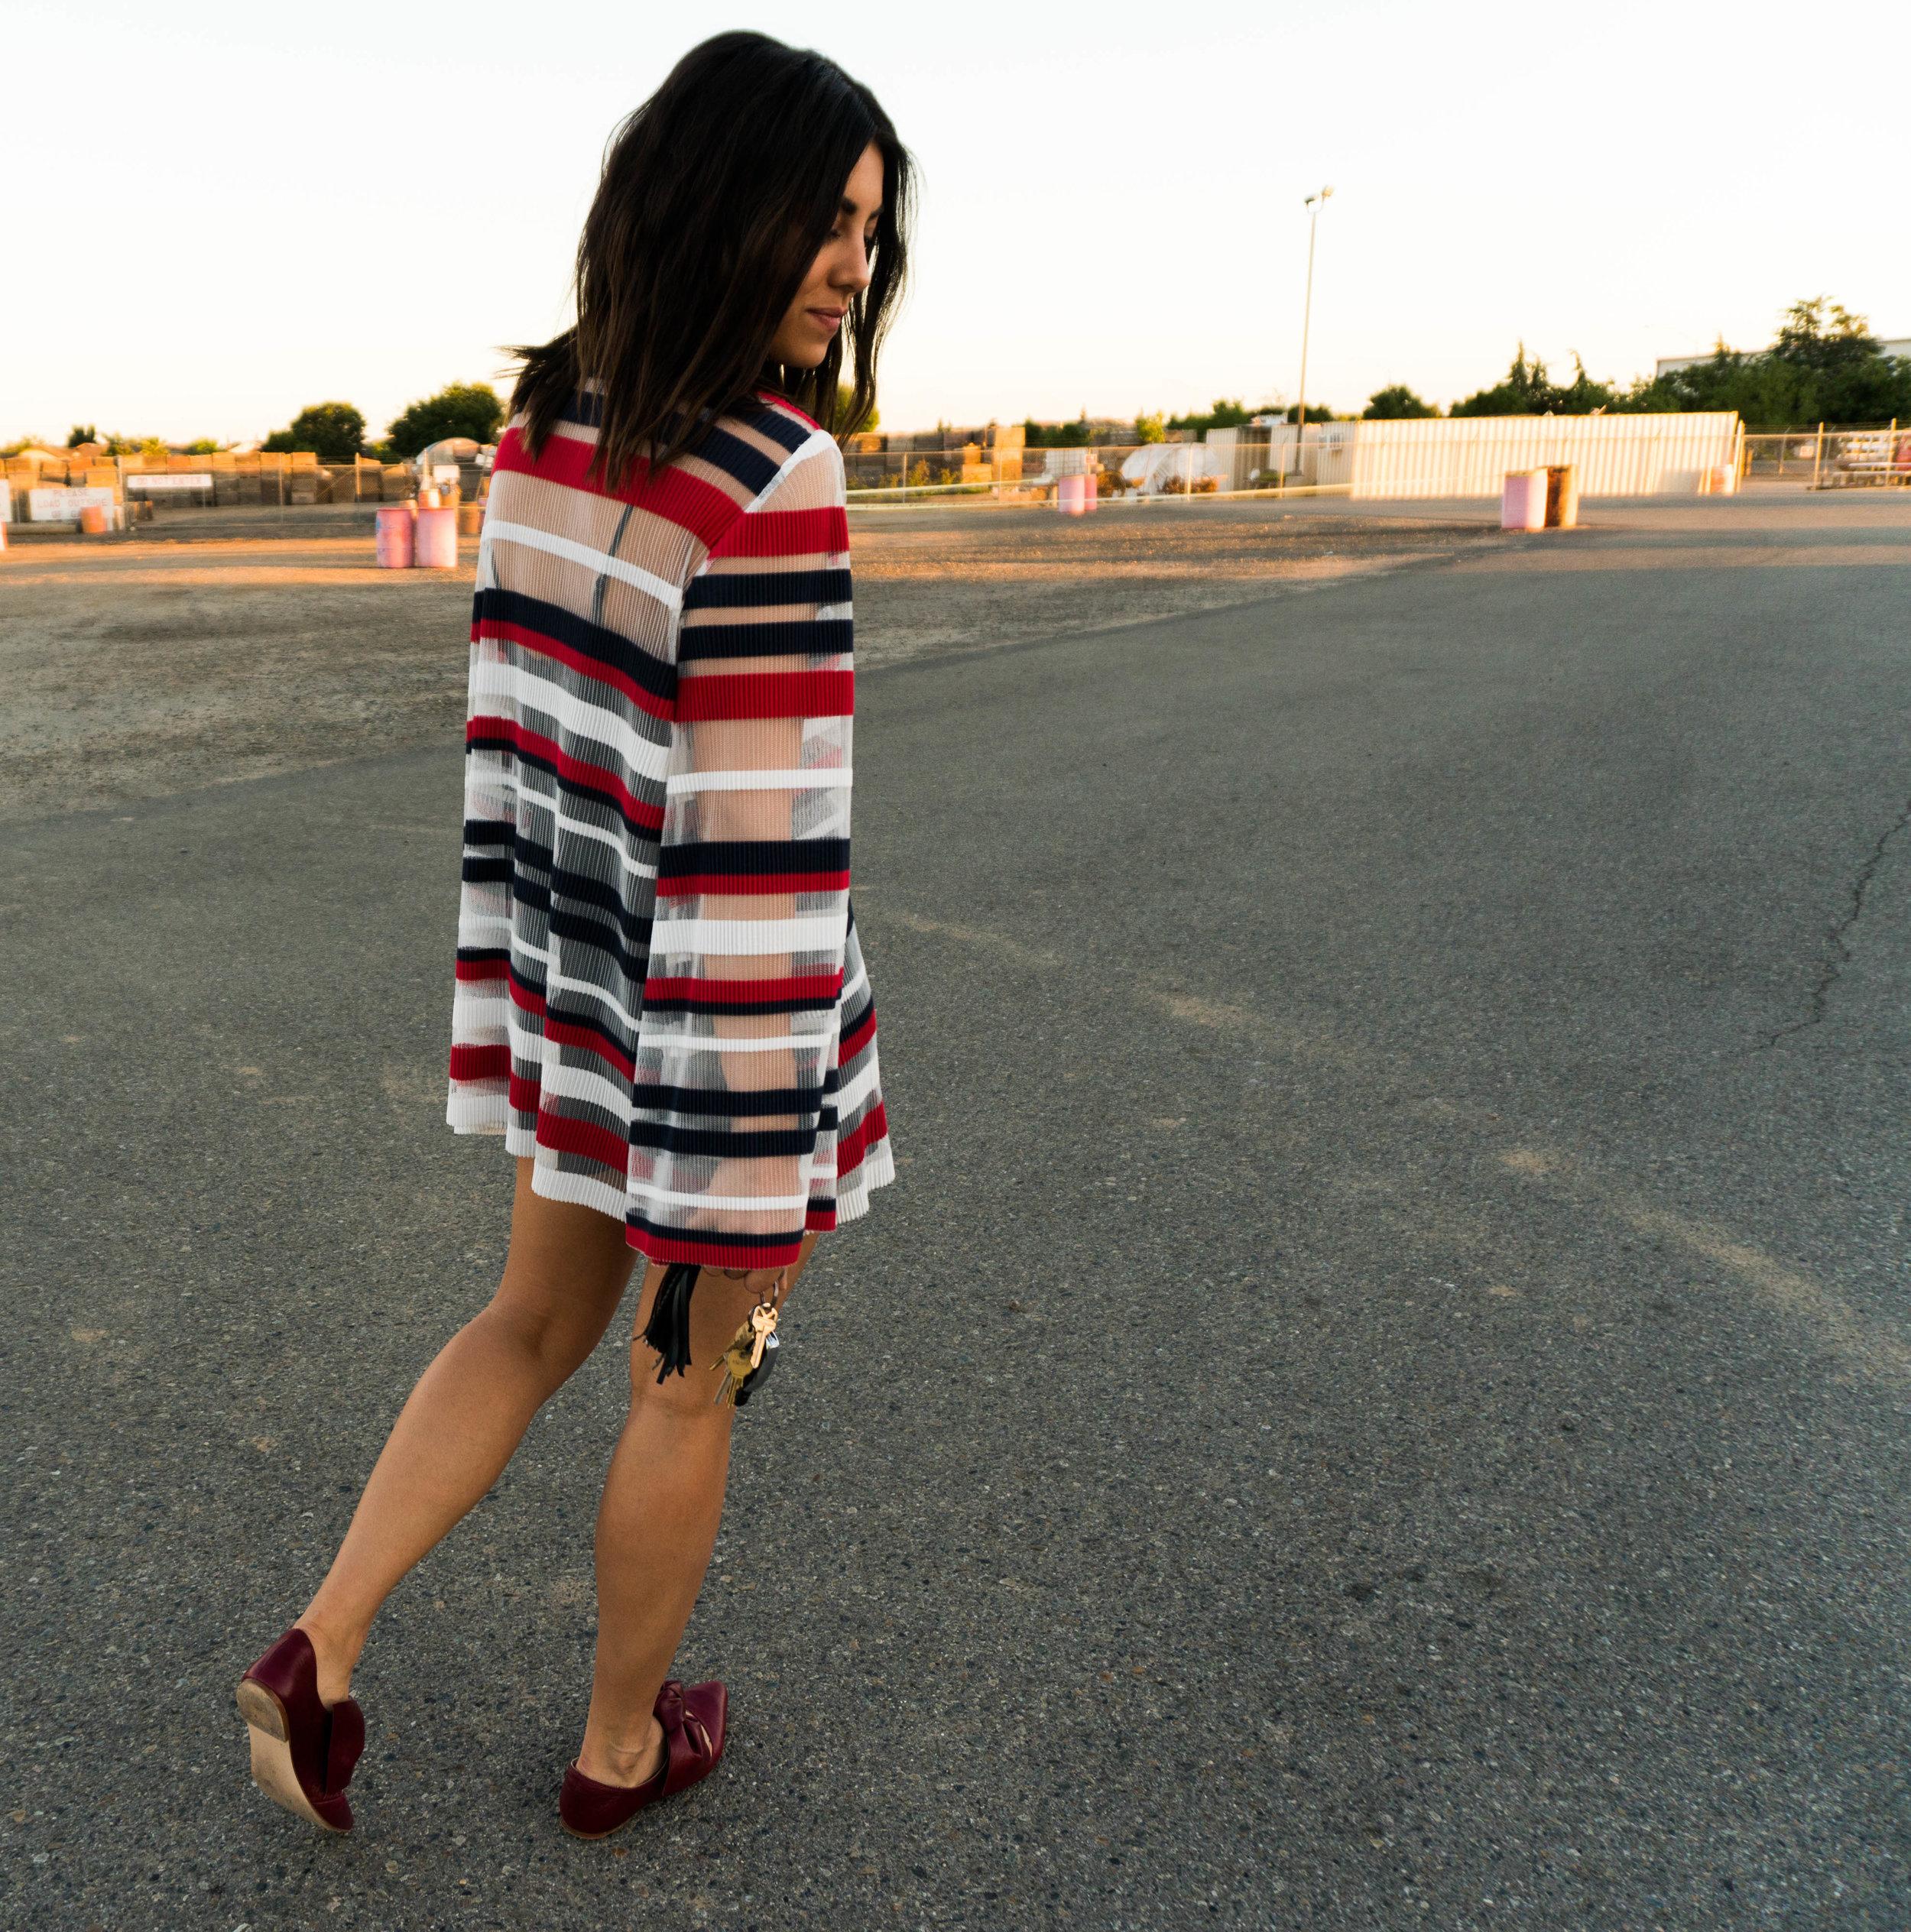 Free People Call Me Mini Dress - Date Night Look - Just As Created 4